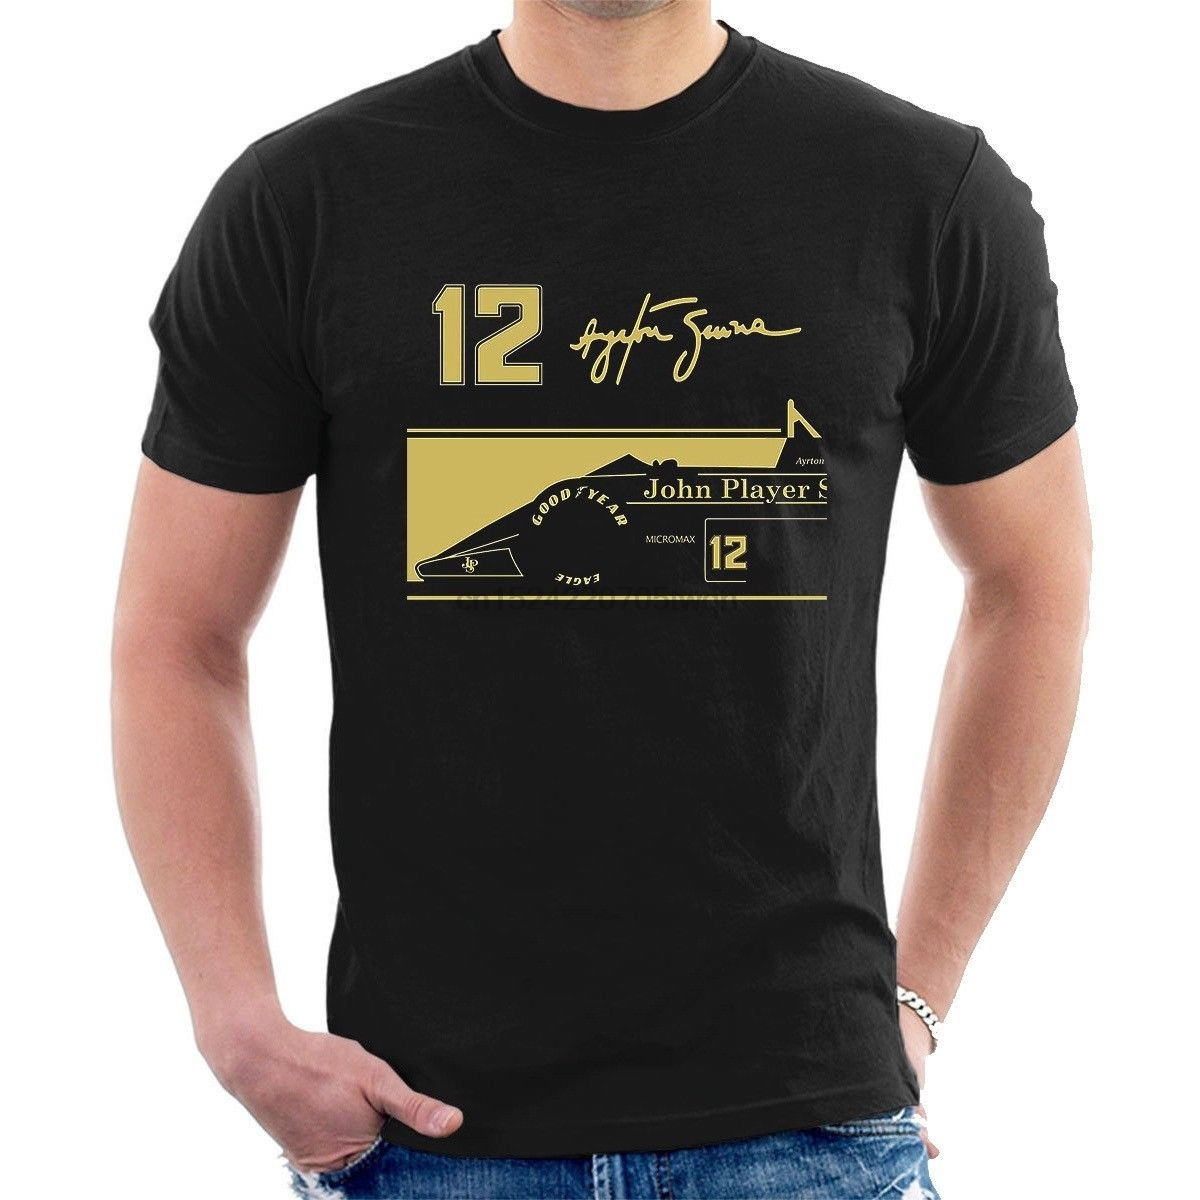 new-fashion-casual-men-t-shirt-novelty-o-neck-tops-ayrton-font-b-senna-b-font-jps-tribute-t-shirt-12-signature-bulk-t-shirts